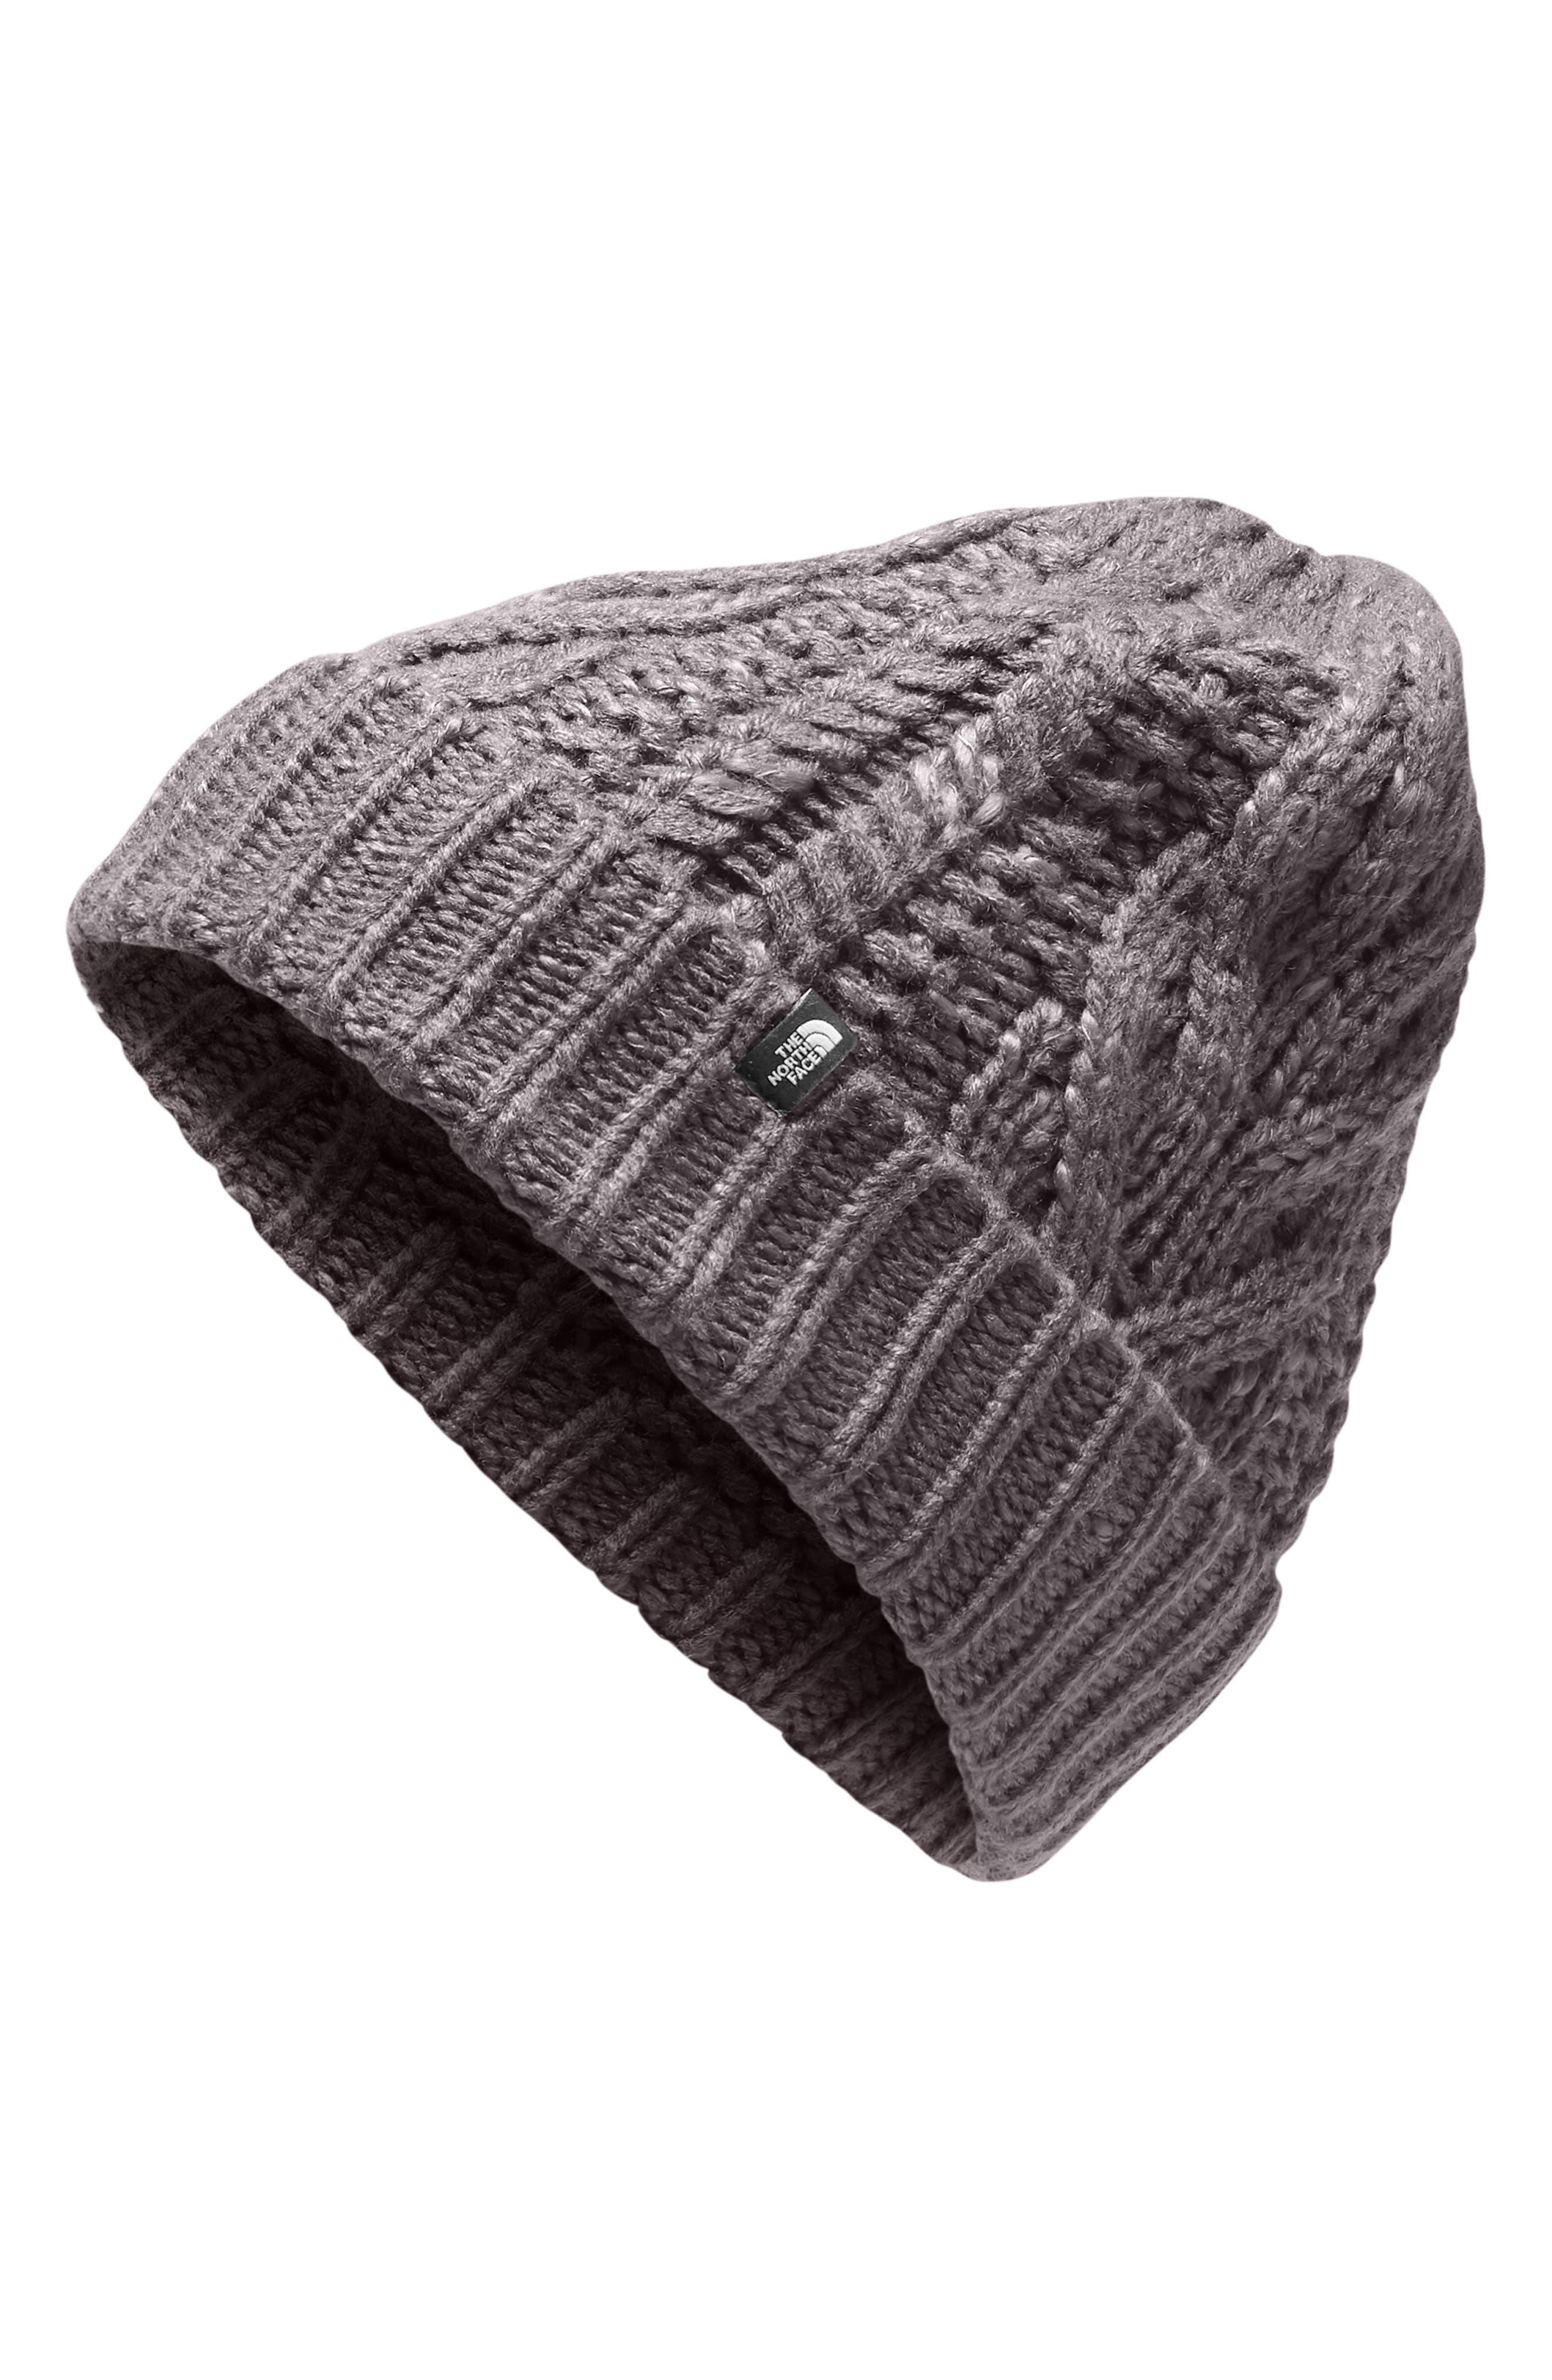 Minna Cable Knit Beanie,                             Main thumbnail 1, color,                             RABBIT GREY